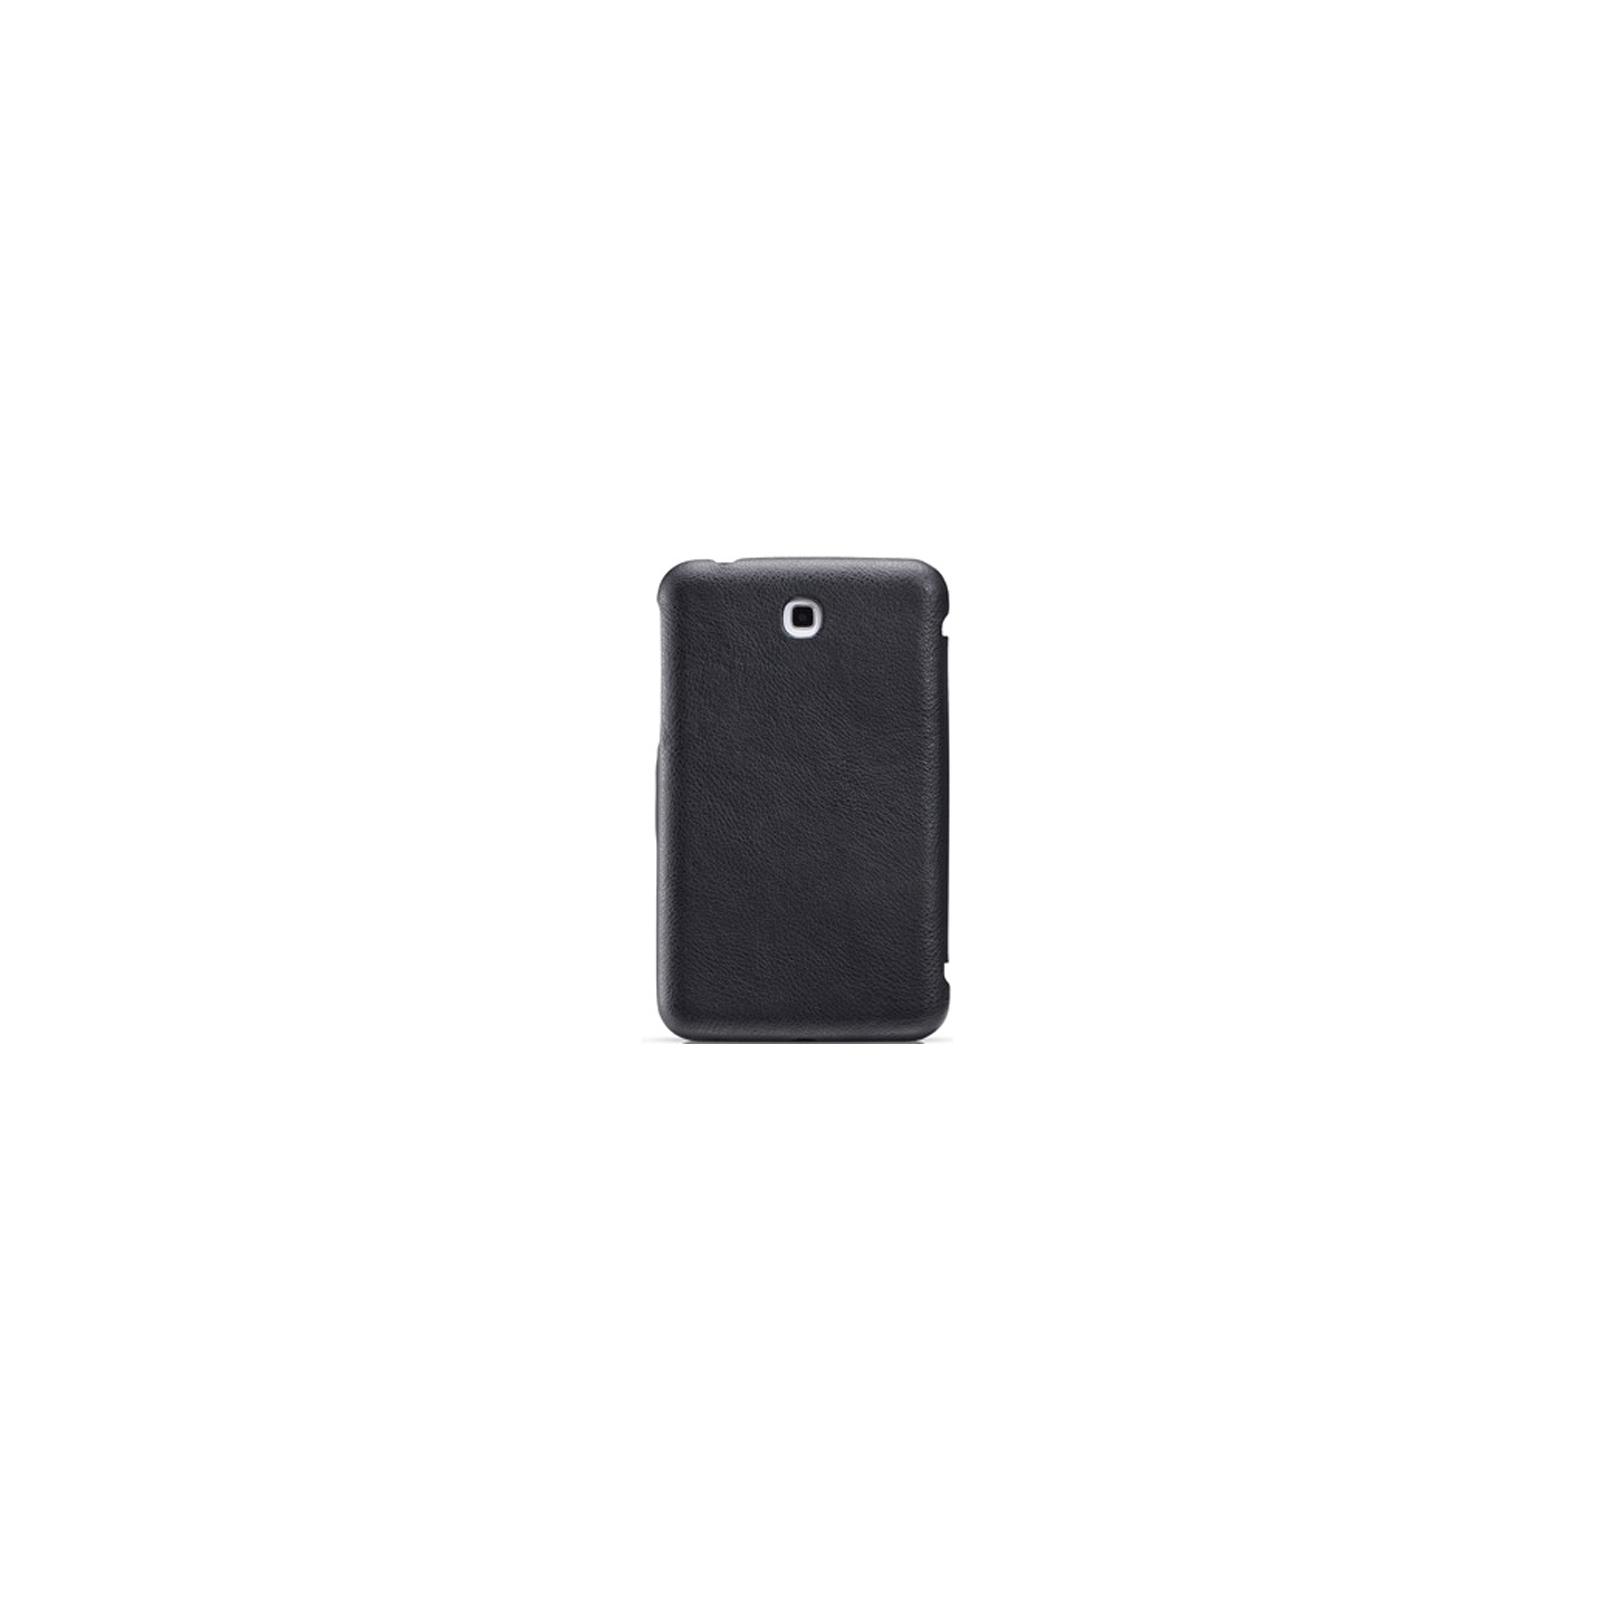 "Чехол для планшета i-Carer 7"" Samsung Galaxy Tab 3 7.0 T2100/P3200 шкіряний (RS320001 Black) изображение 2"